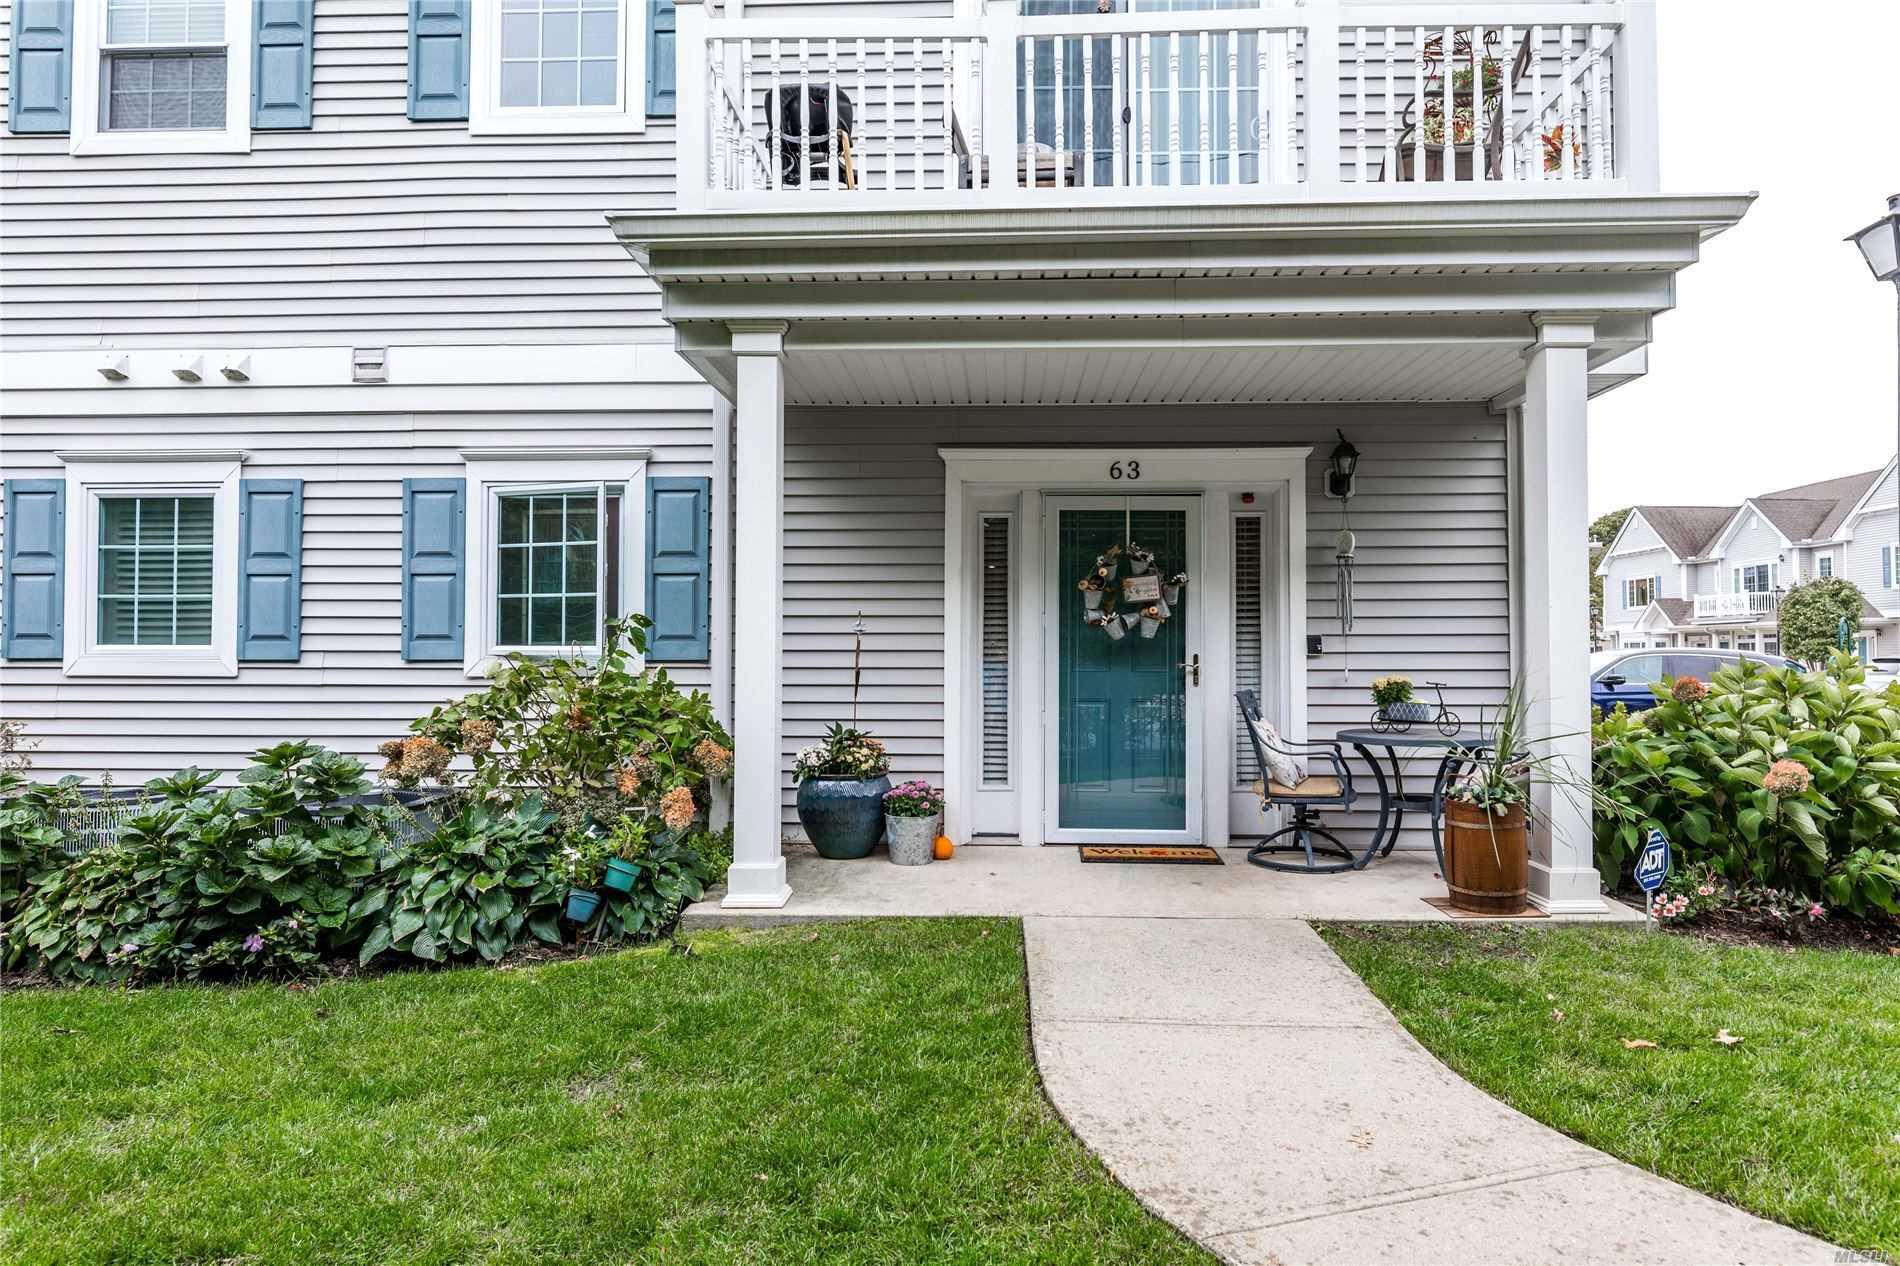 Property for sale at 63 Barbara Court, Amityville NY 11701, Amityville,  New York 11701